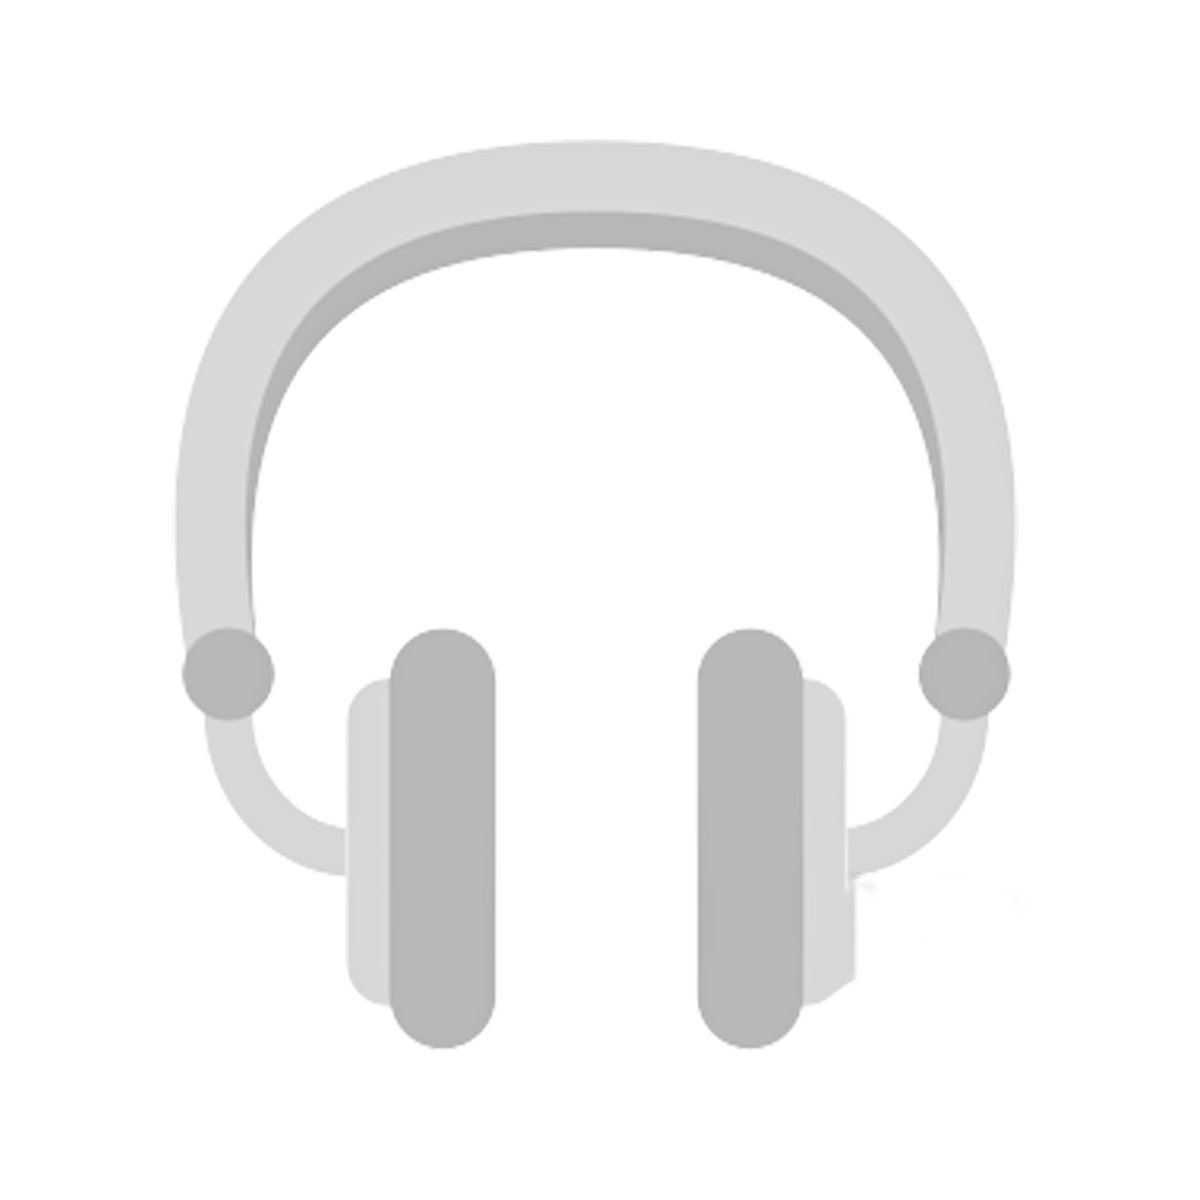 Apple Studio Headphones Leak